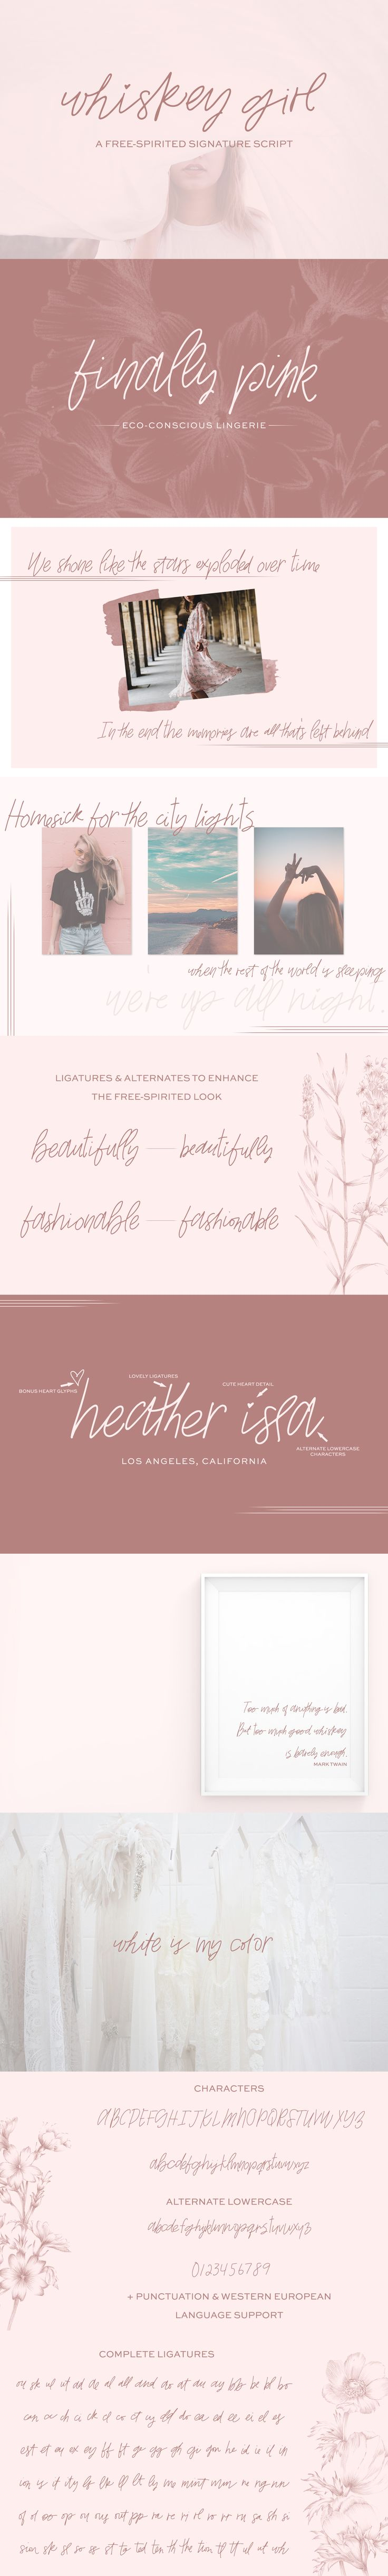 Whiskey Girl, handwritten script font - luxury font, fashion font, handwriting font